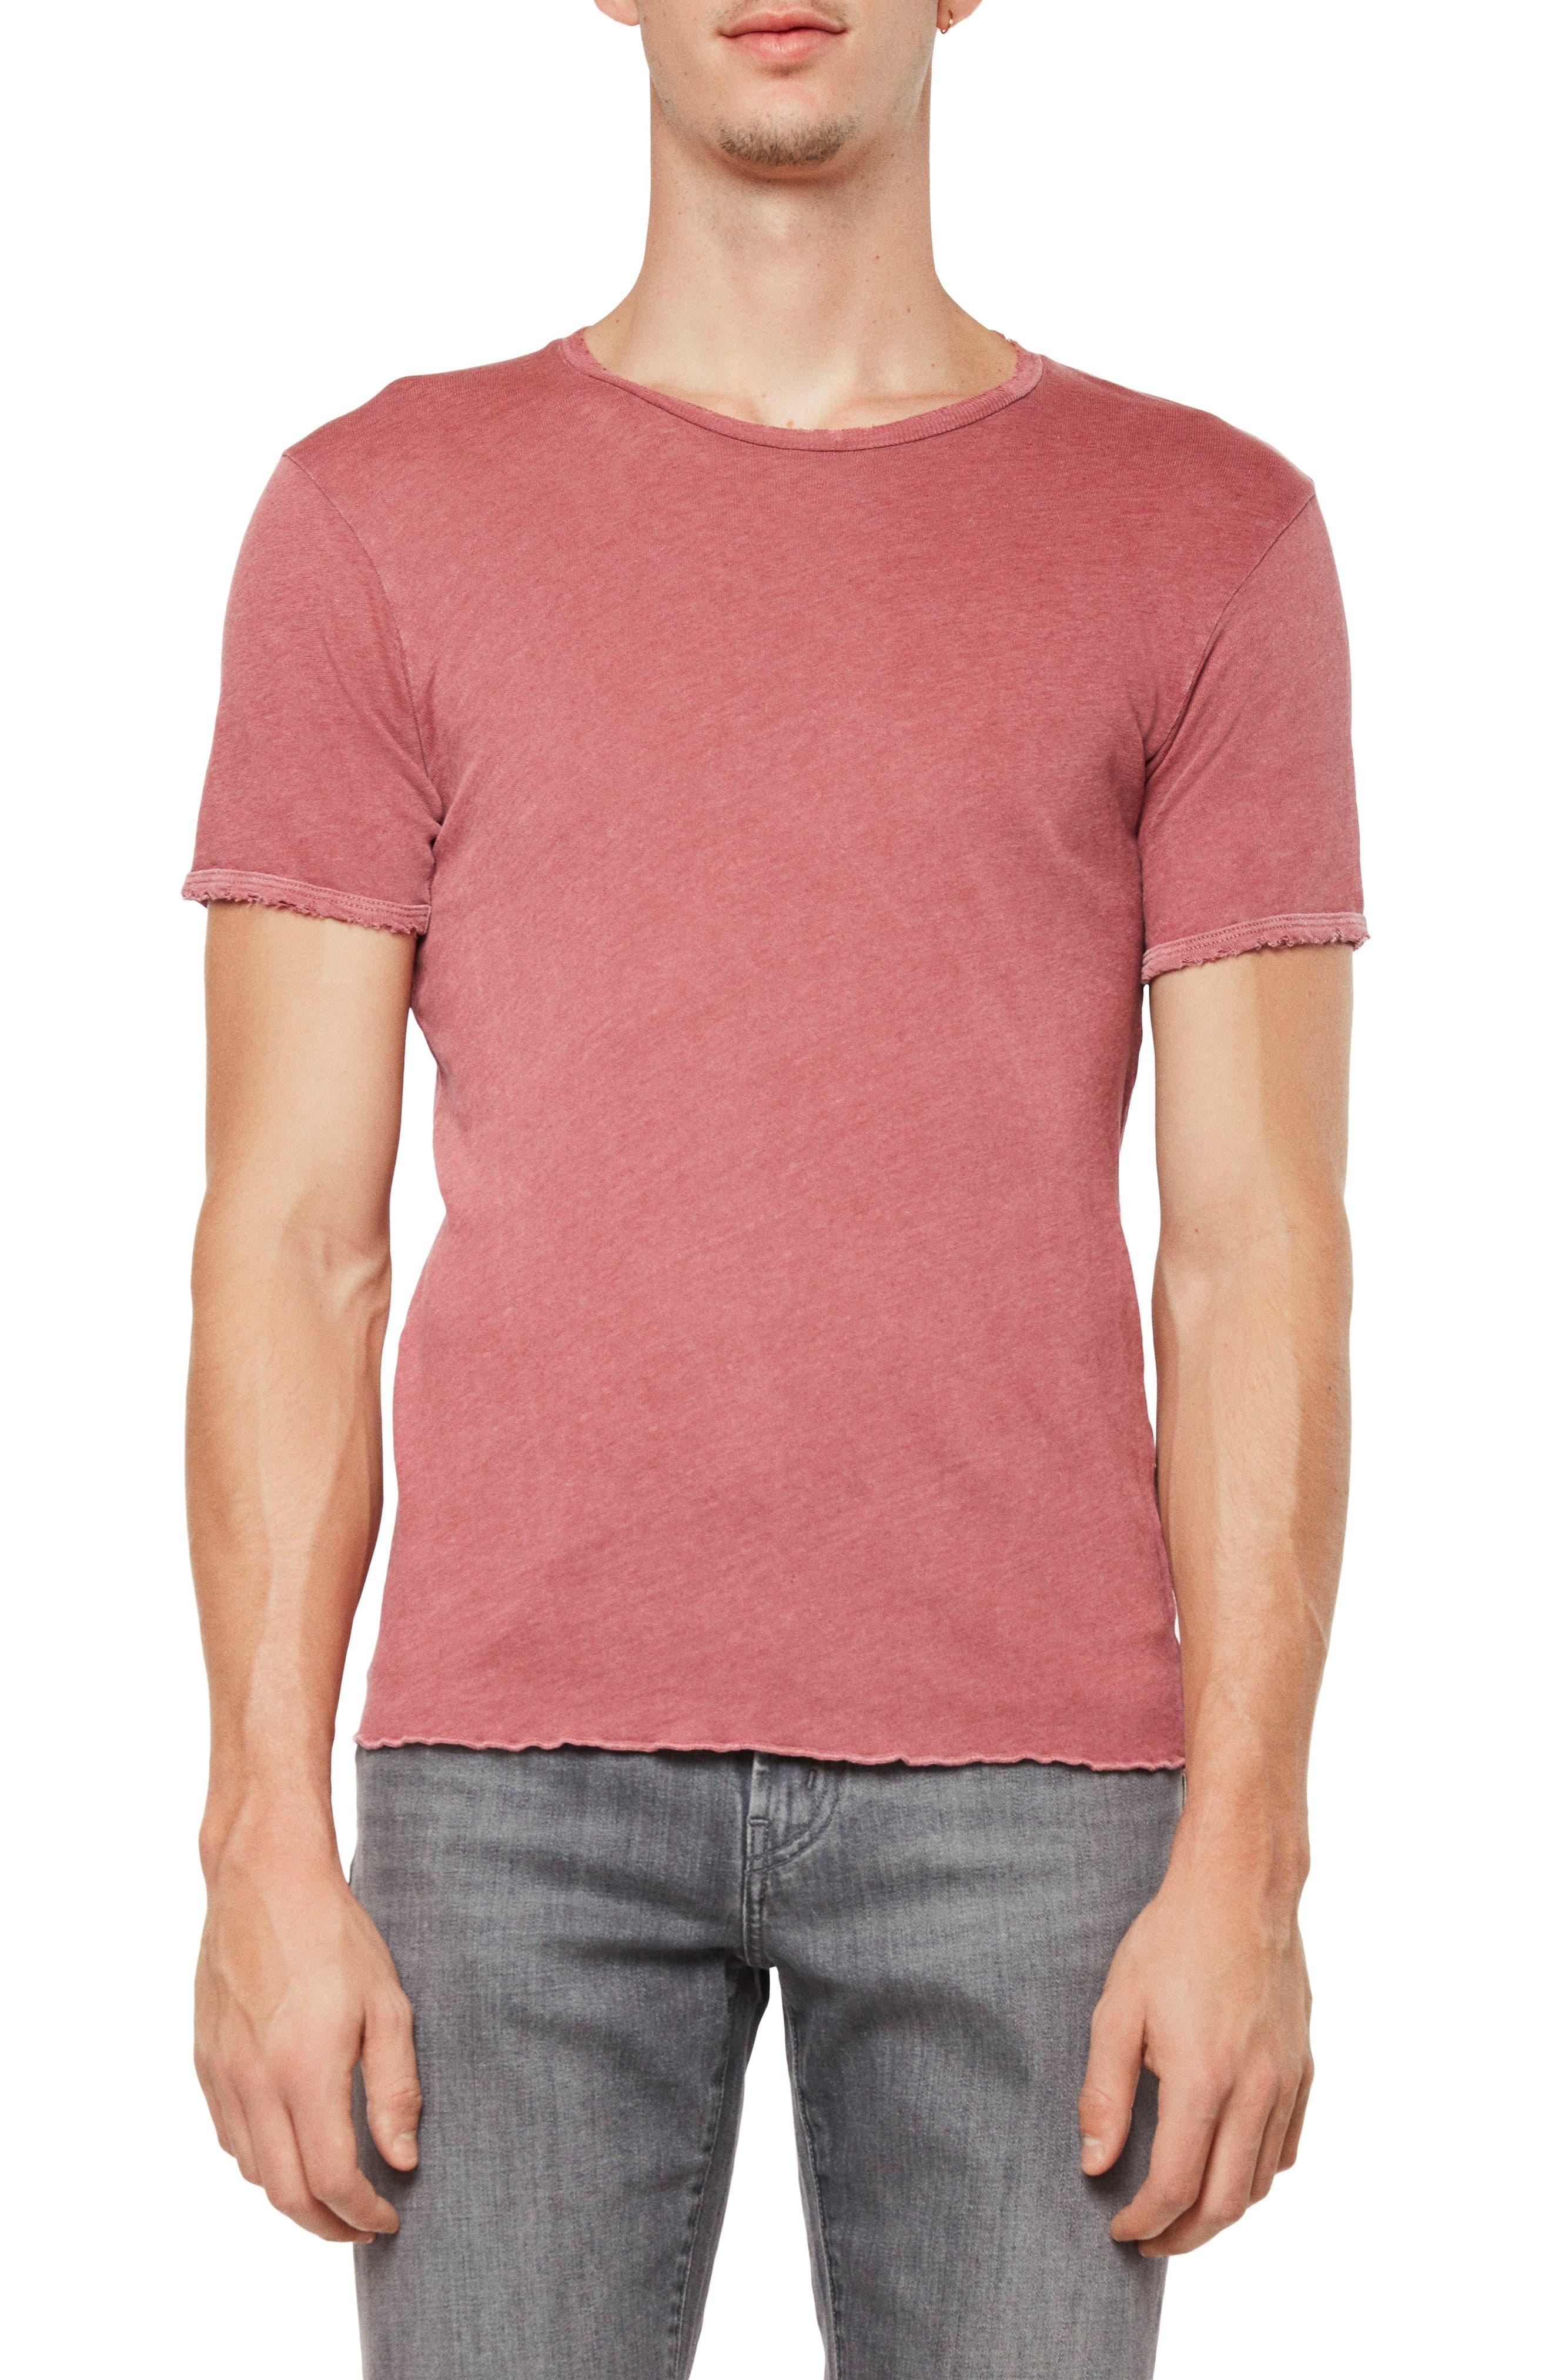 J Brand Men's Heathered Grandpa T-shirt In Distressed Karst